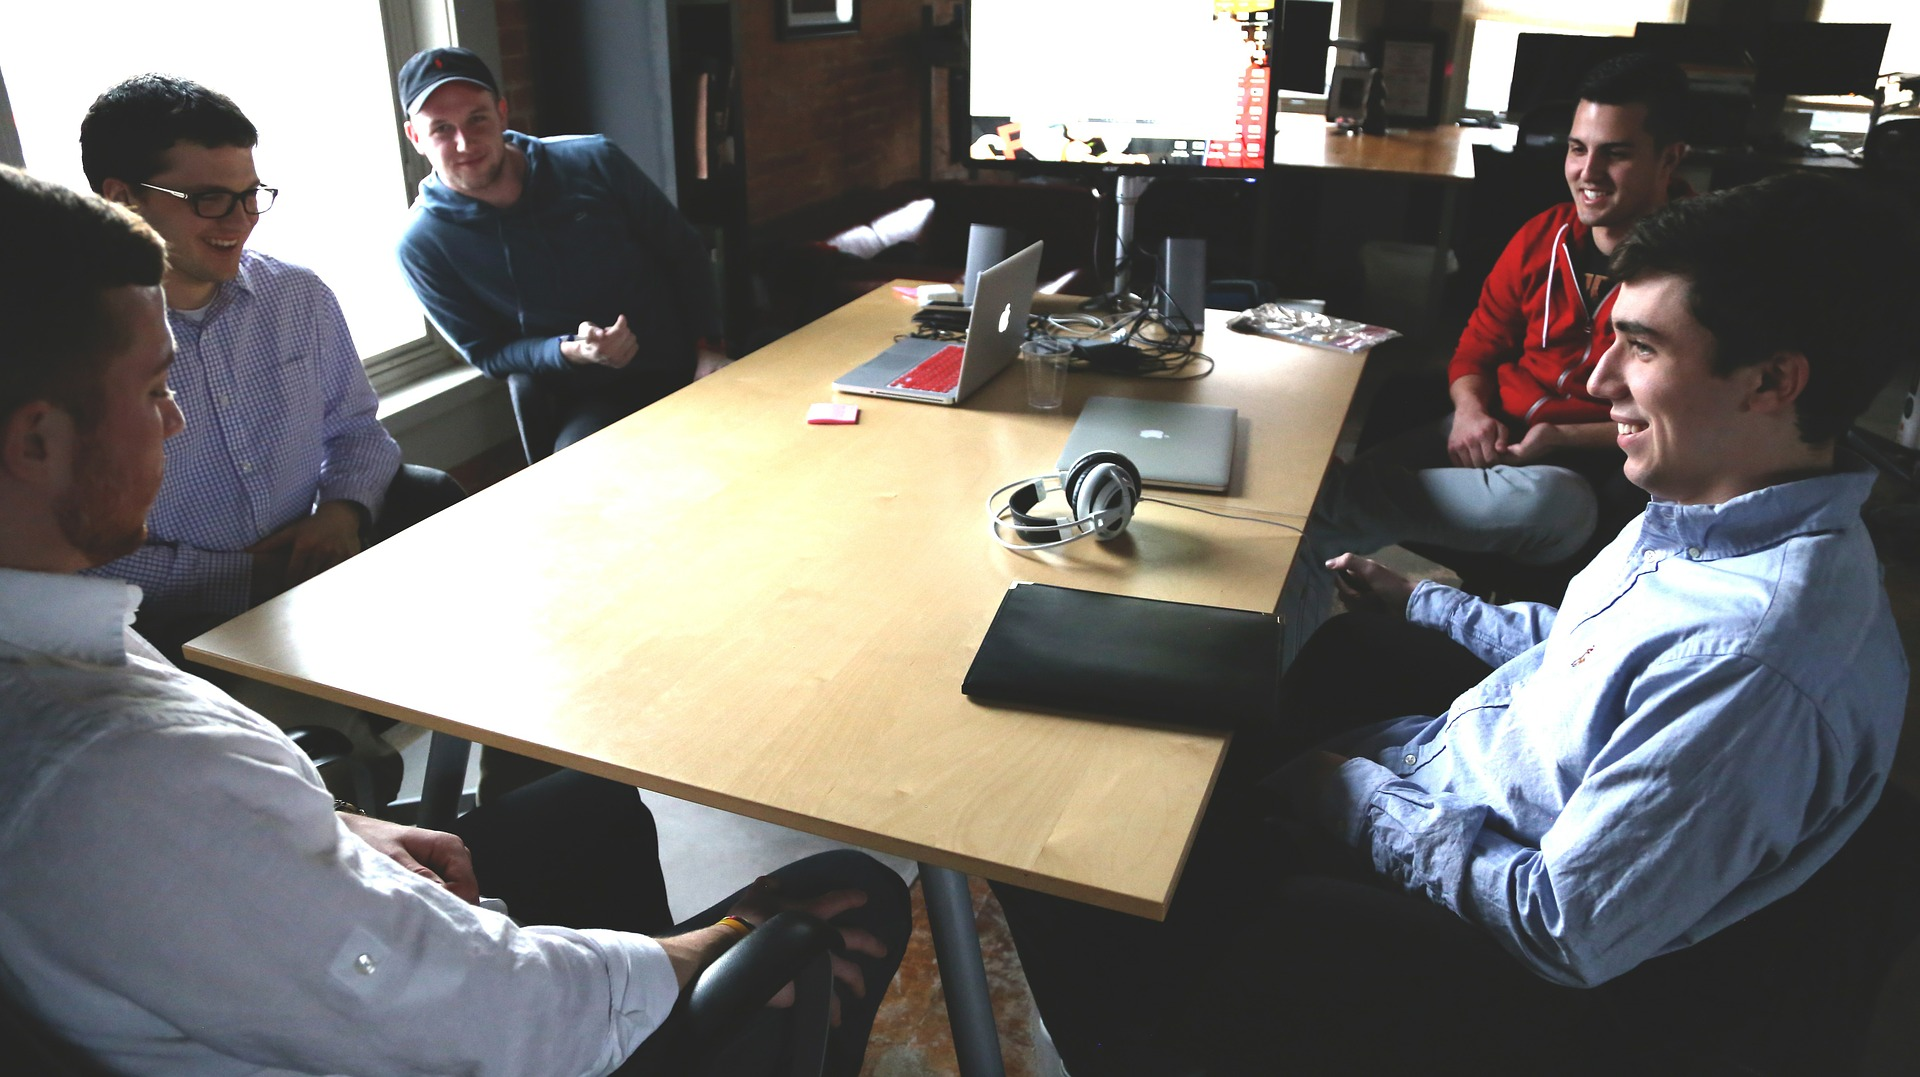 Linkedin: plataforma conecta profissionais a empresas